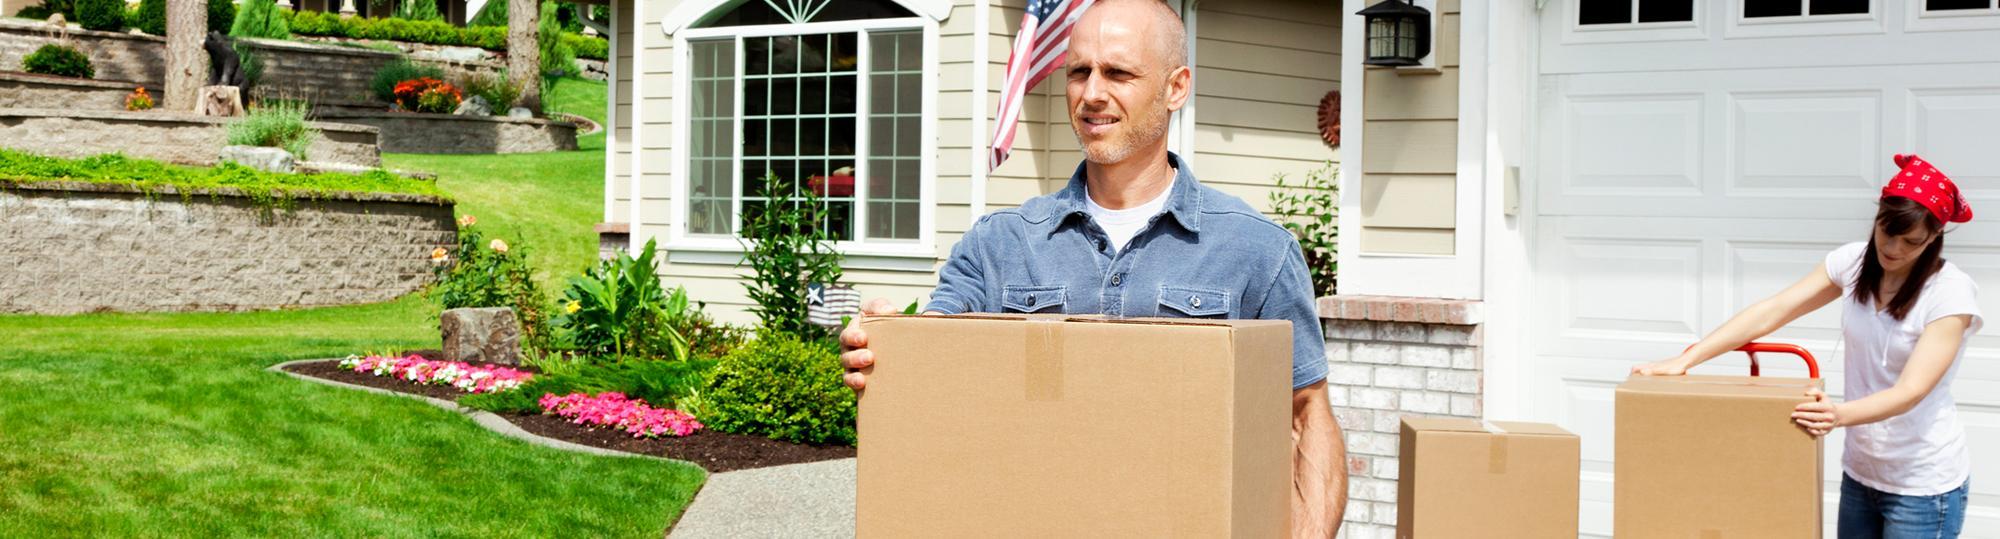 north american van lines deal hero family moving